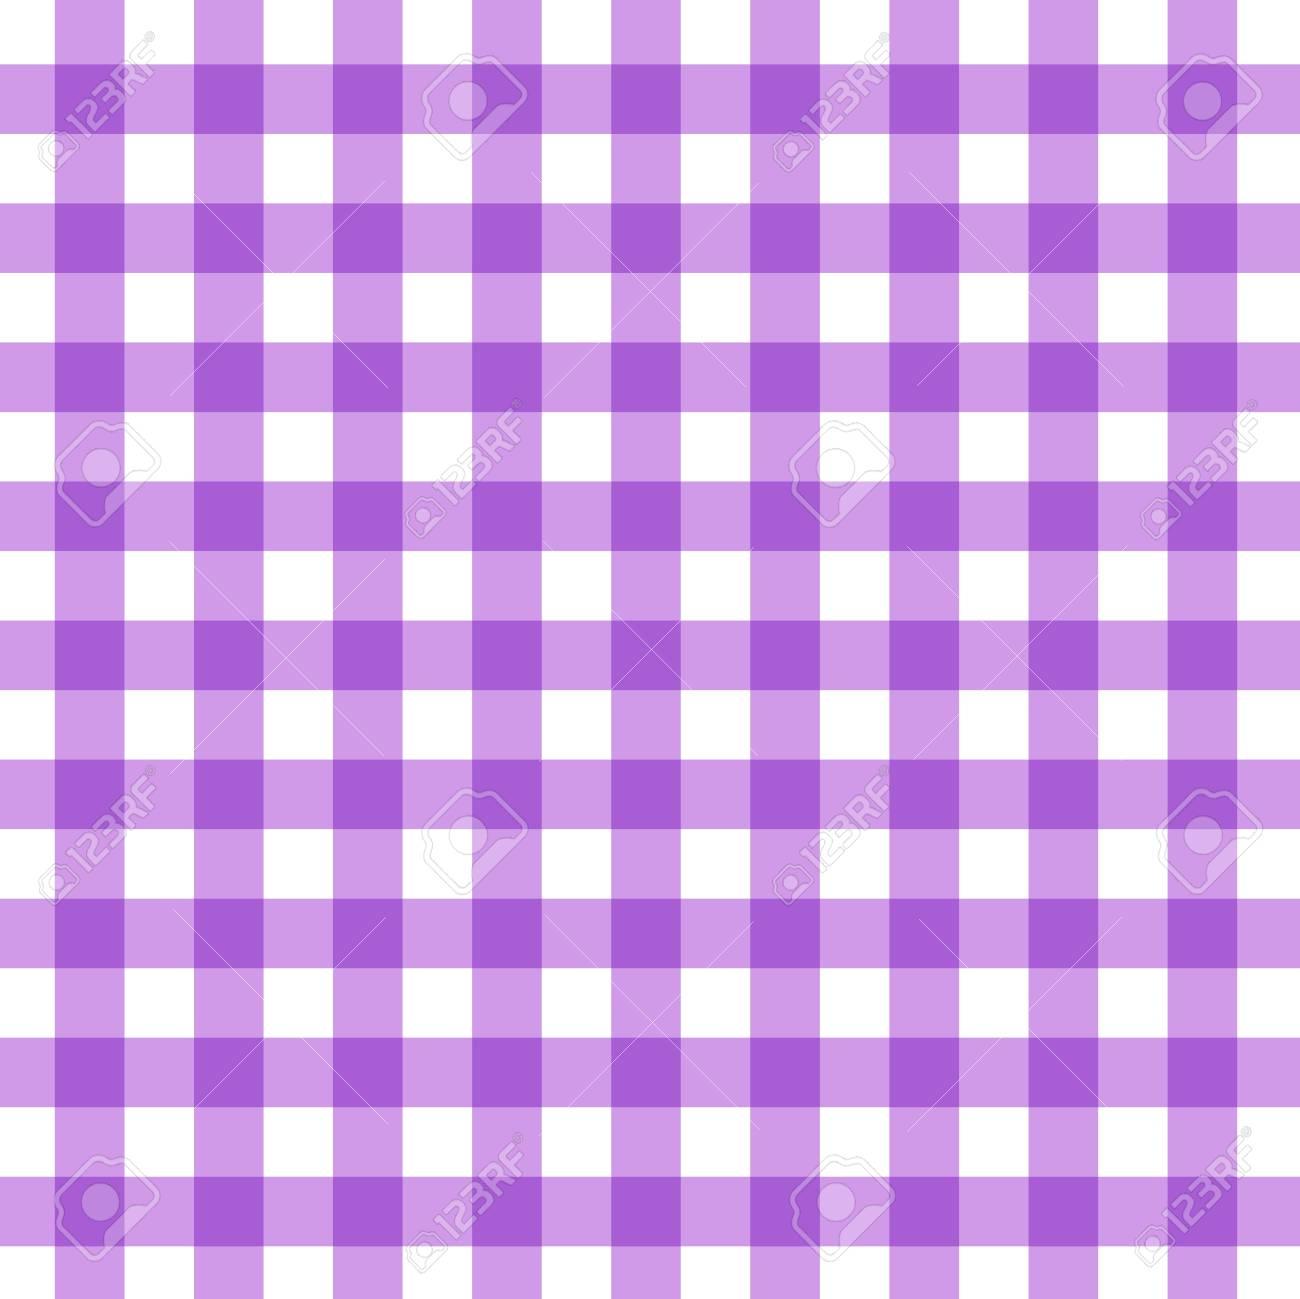 Ordinaire Tartan Plaid Seamless Pattern. Kitchen Checkered Purple Tablecloth Napkin  Fabric Background. Stock Vector